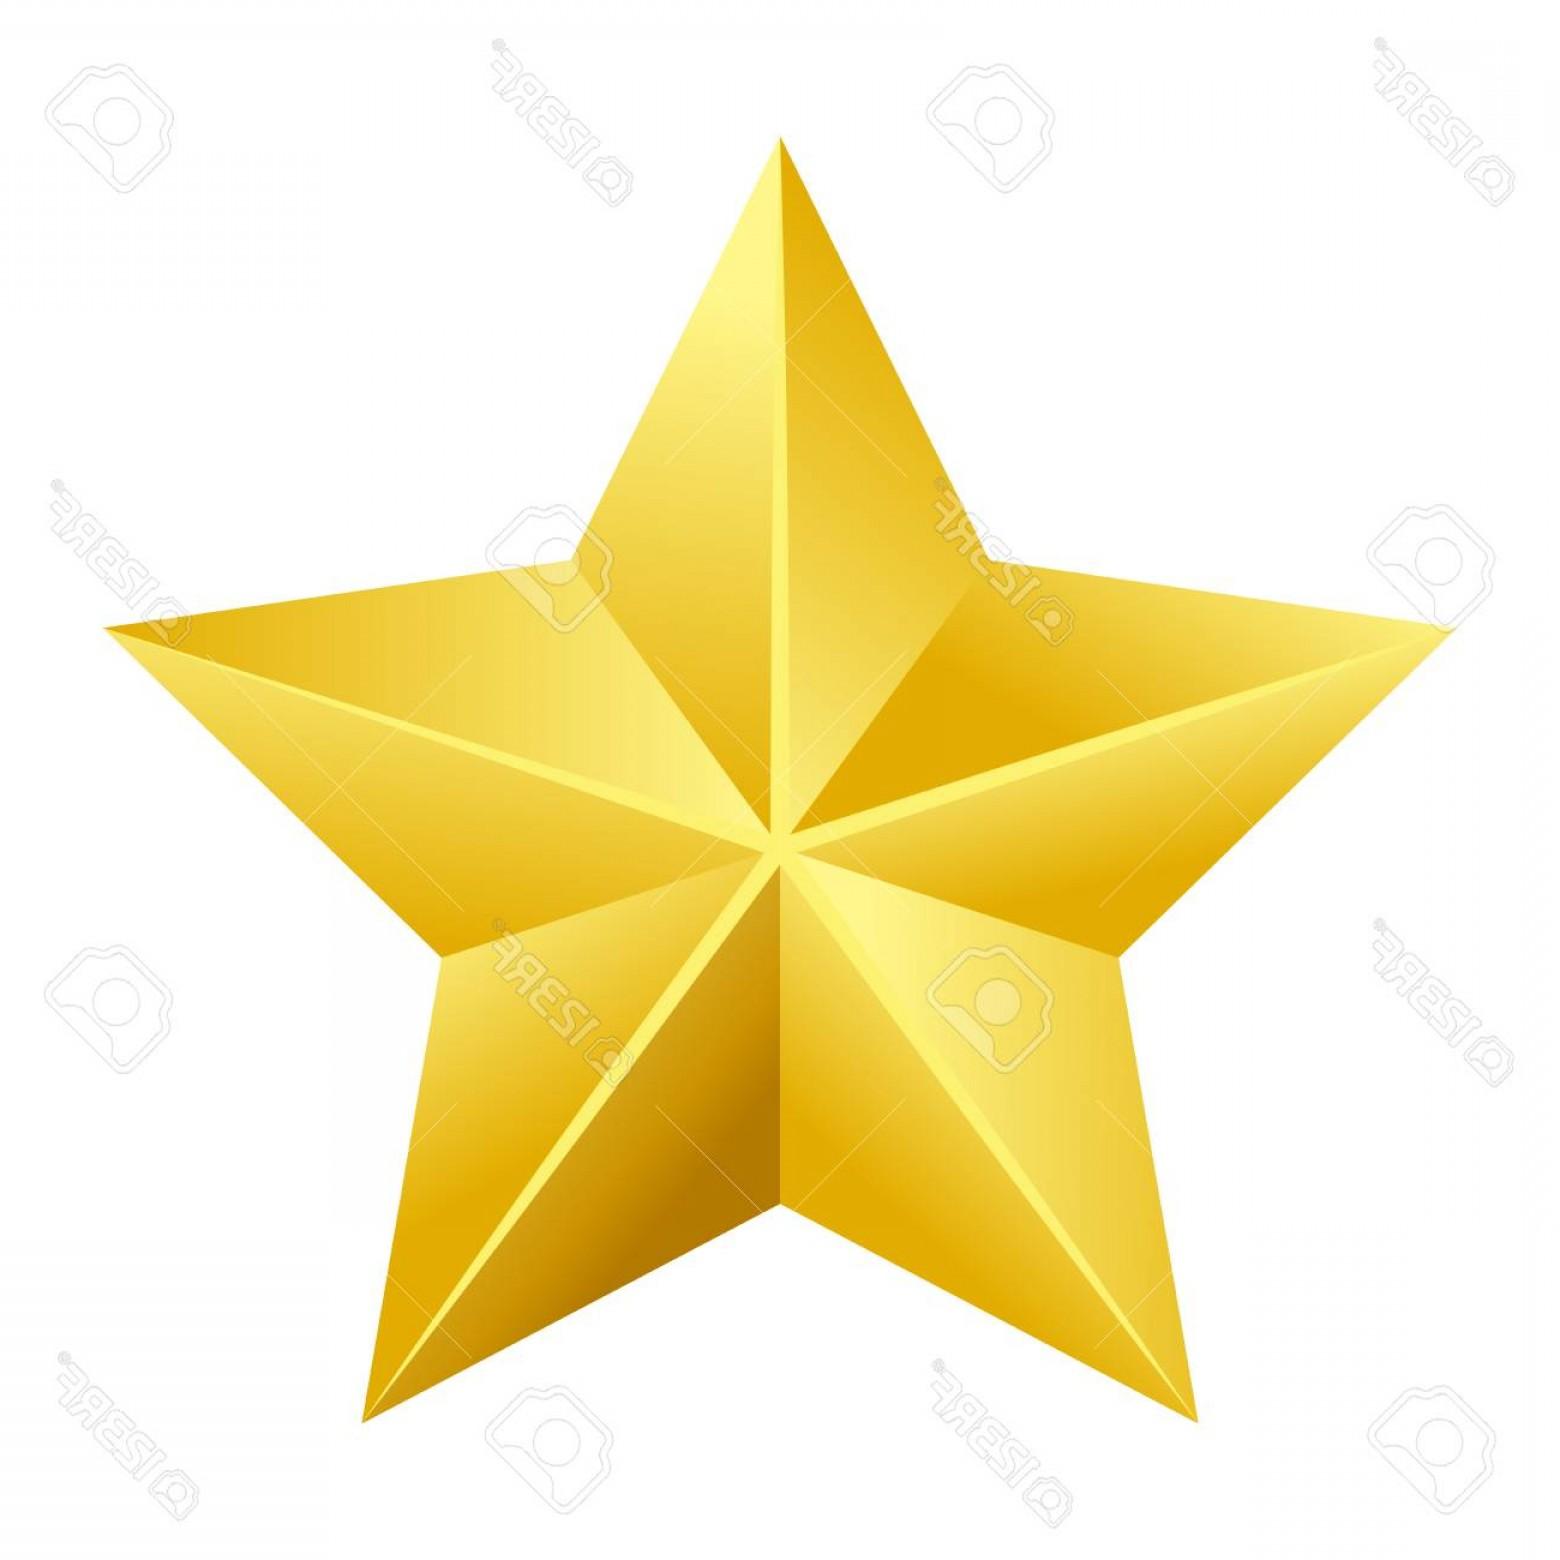 1560x1560 Multi Pointed Star Vector Art Lazttweet